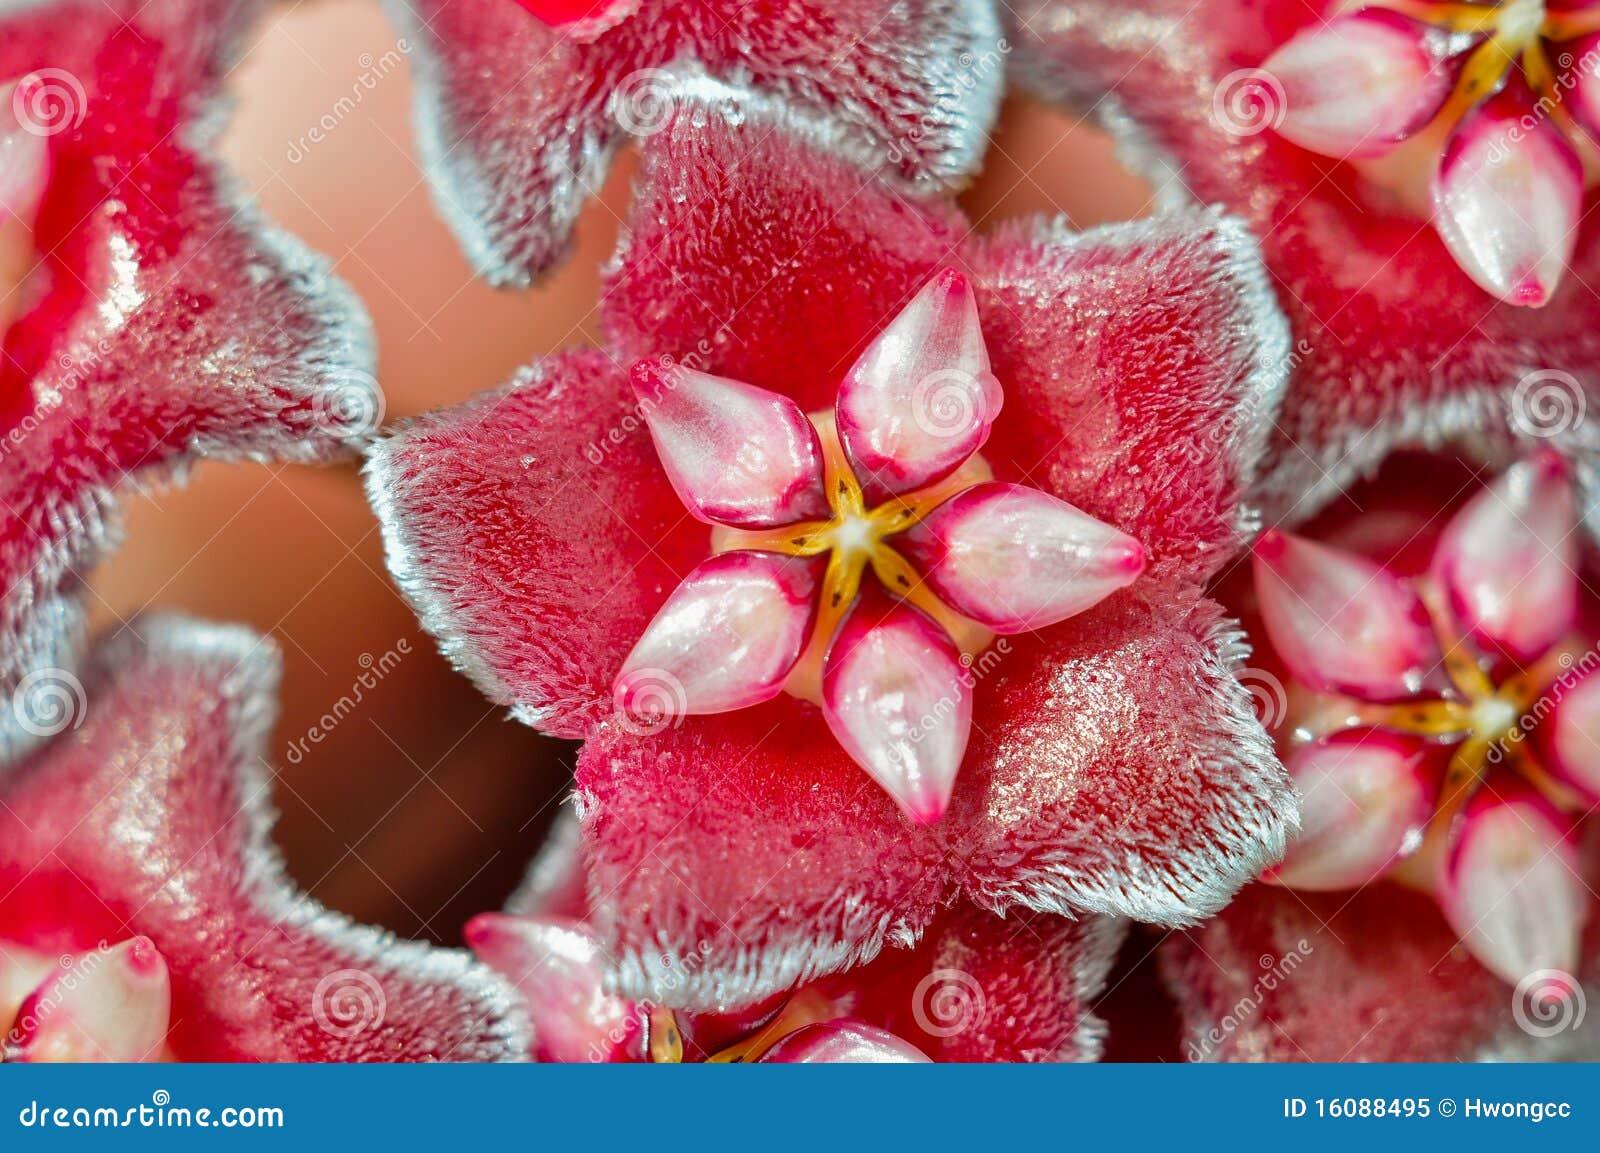 Hoya Flowers Hoya Carnosa Macro Royalty Free Stock Photo